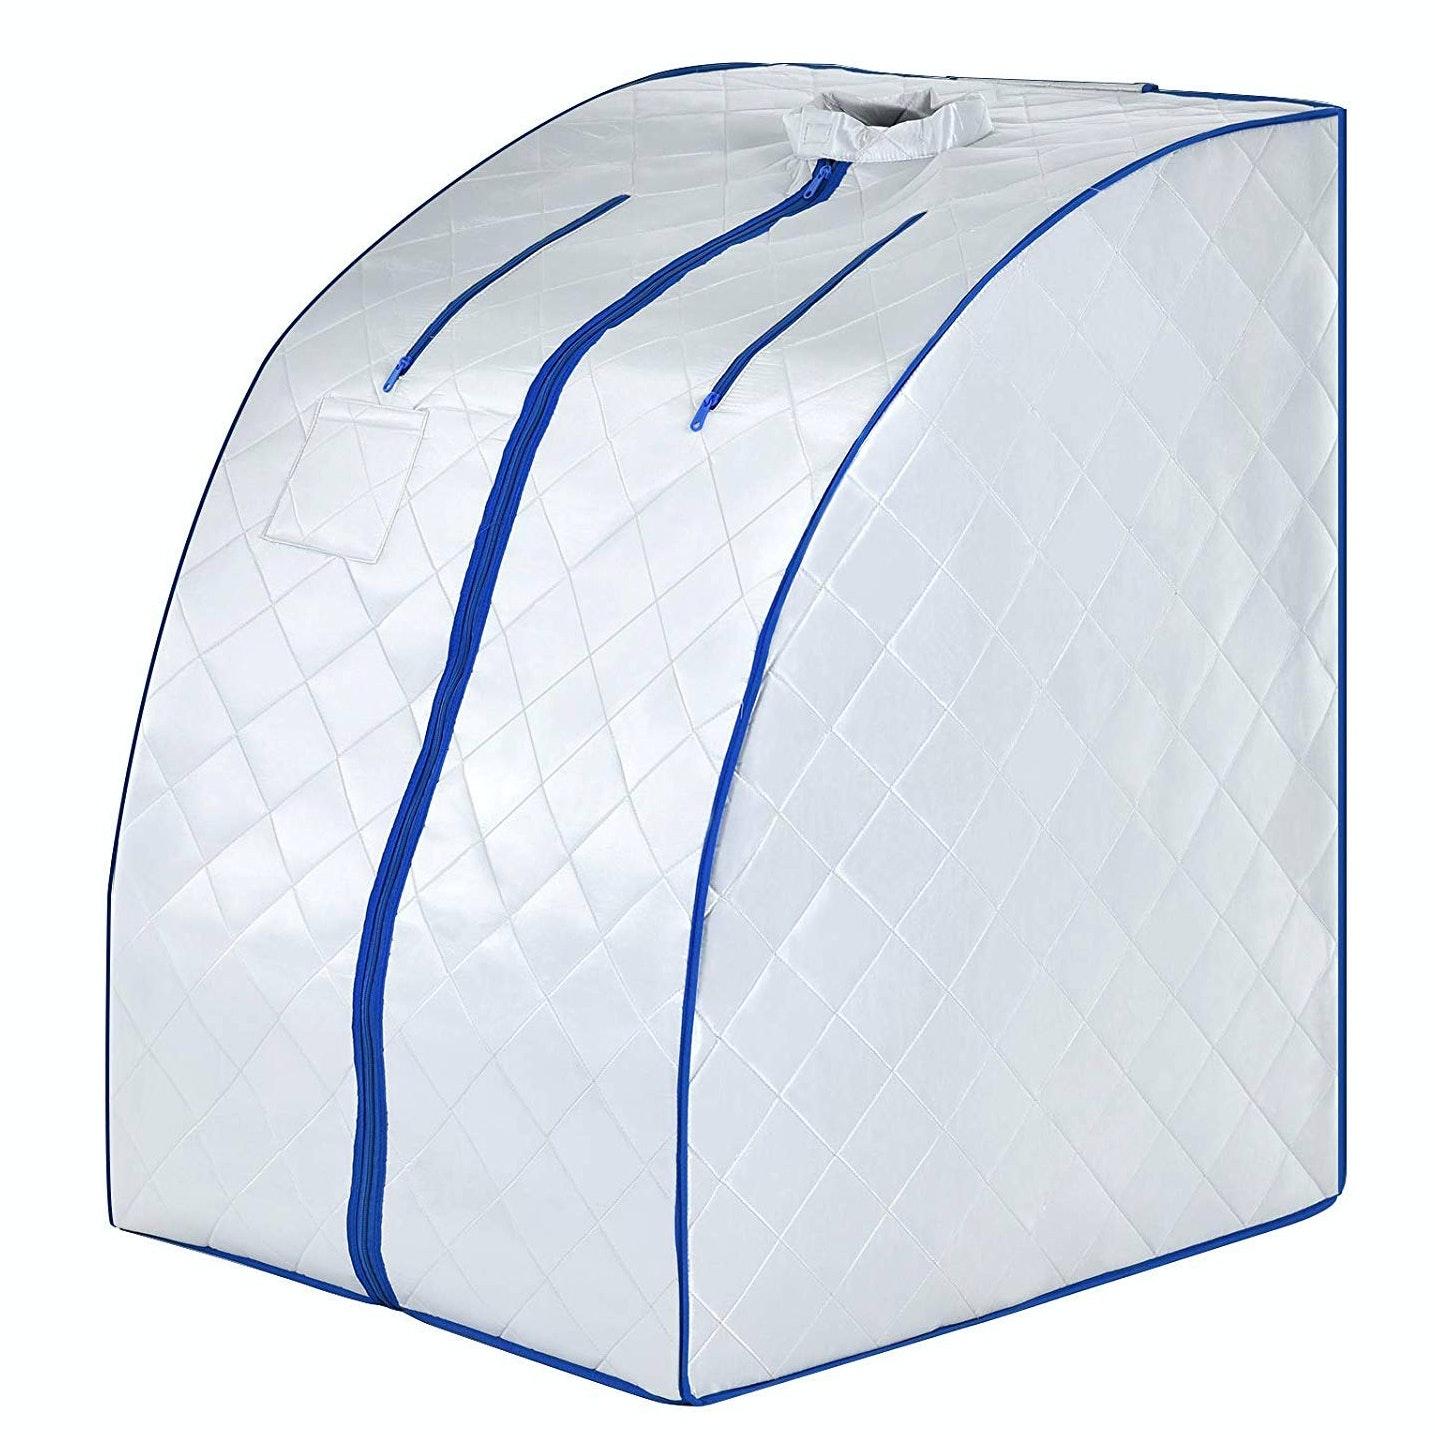 Kuppet® Portable Infrared Home Spa